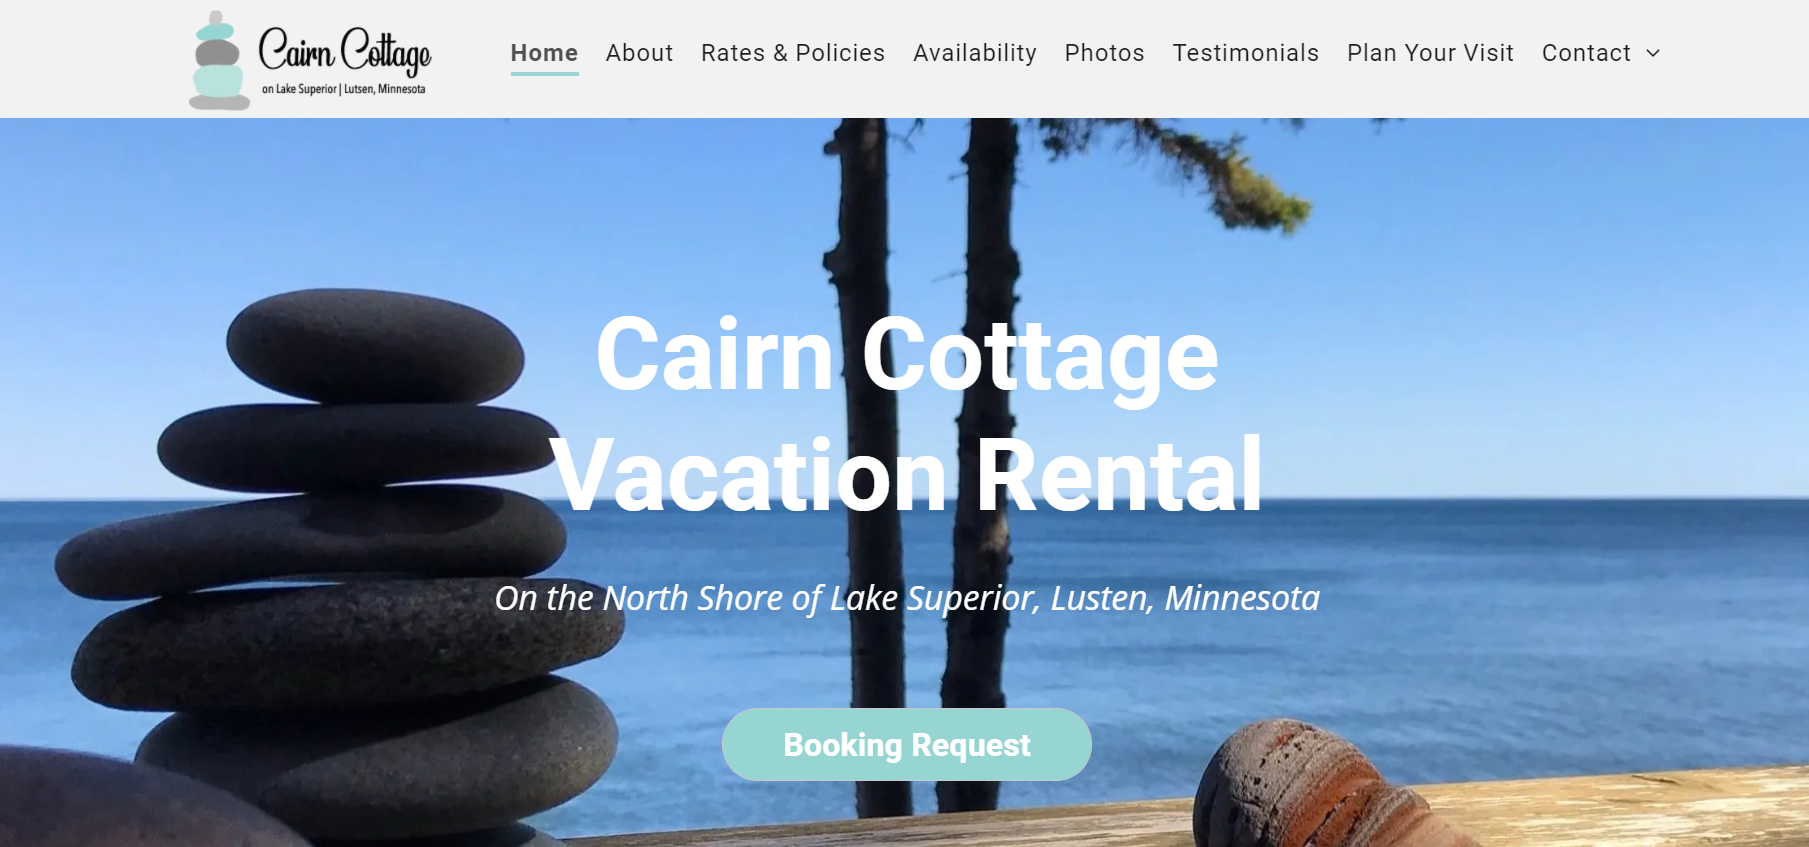 Cairn Cottage Vacation Rental - Lutsen, Minnesota